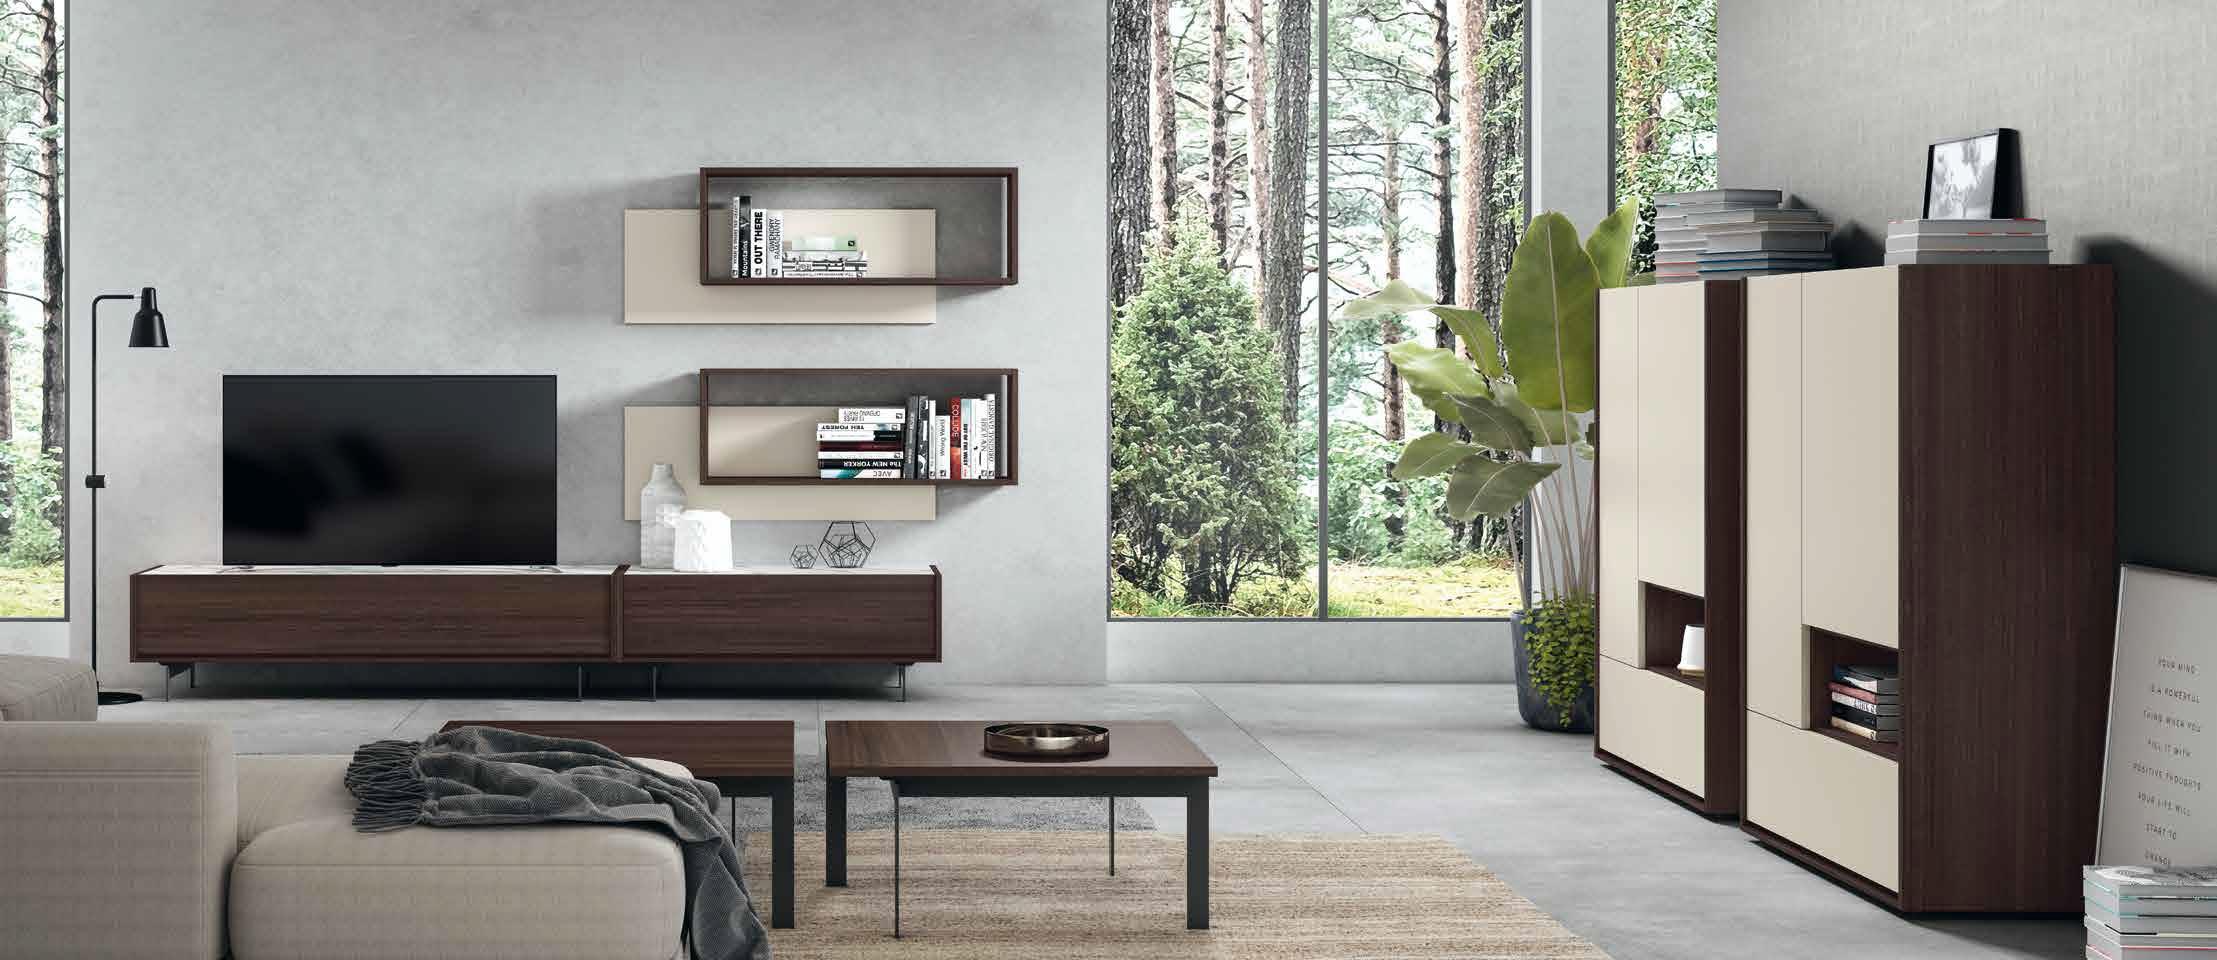 salon-moderno-Nativ-2019-muebles-paco-caballero-0920-5c8cea99dcb4a